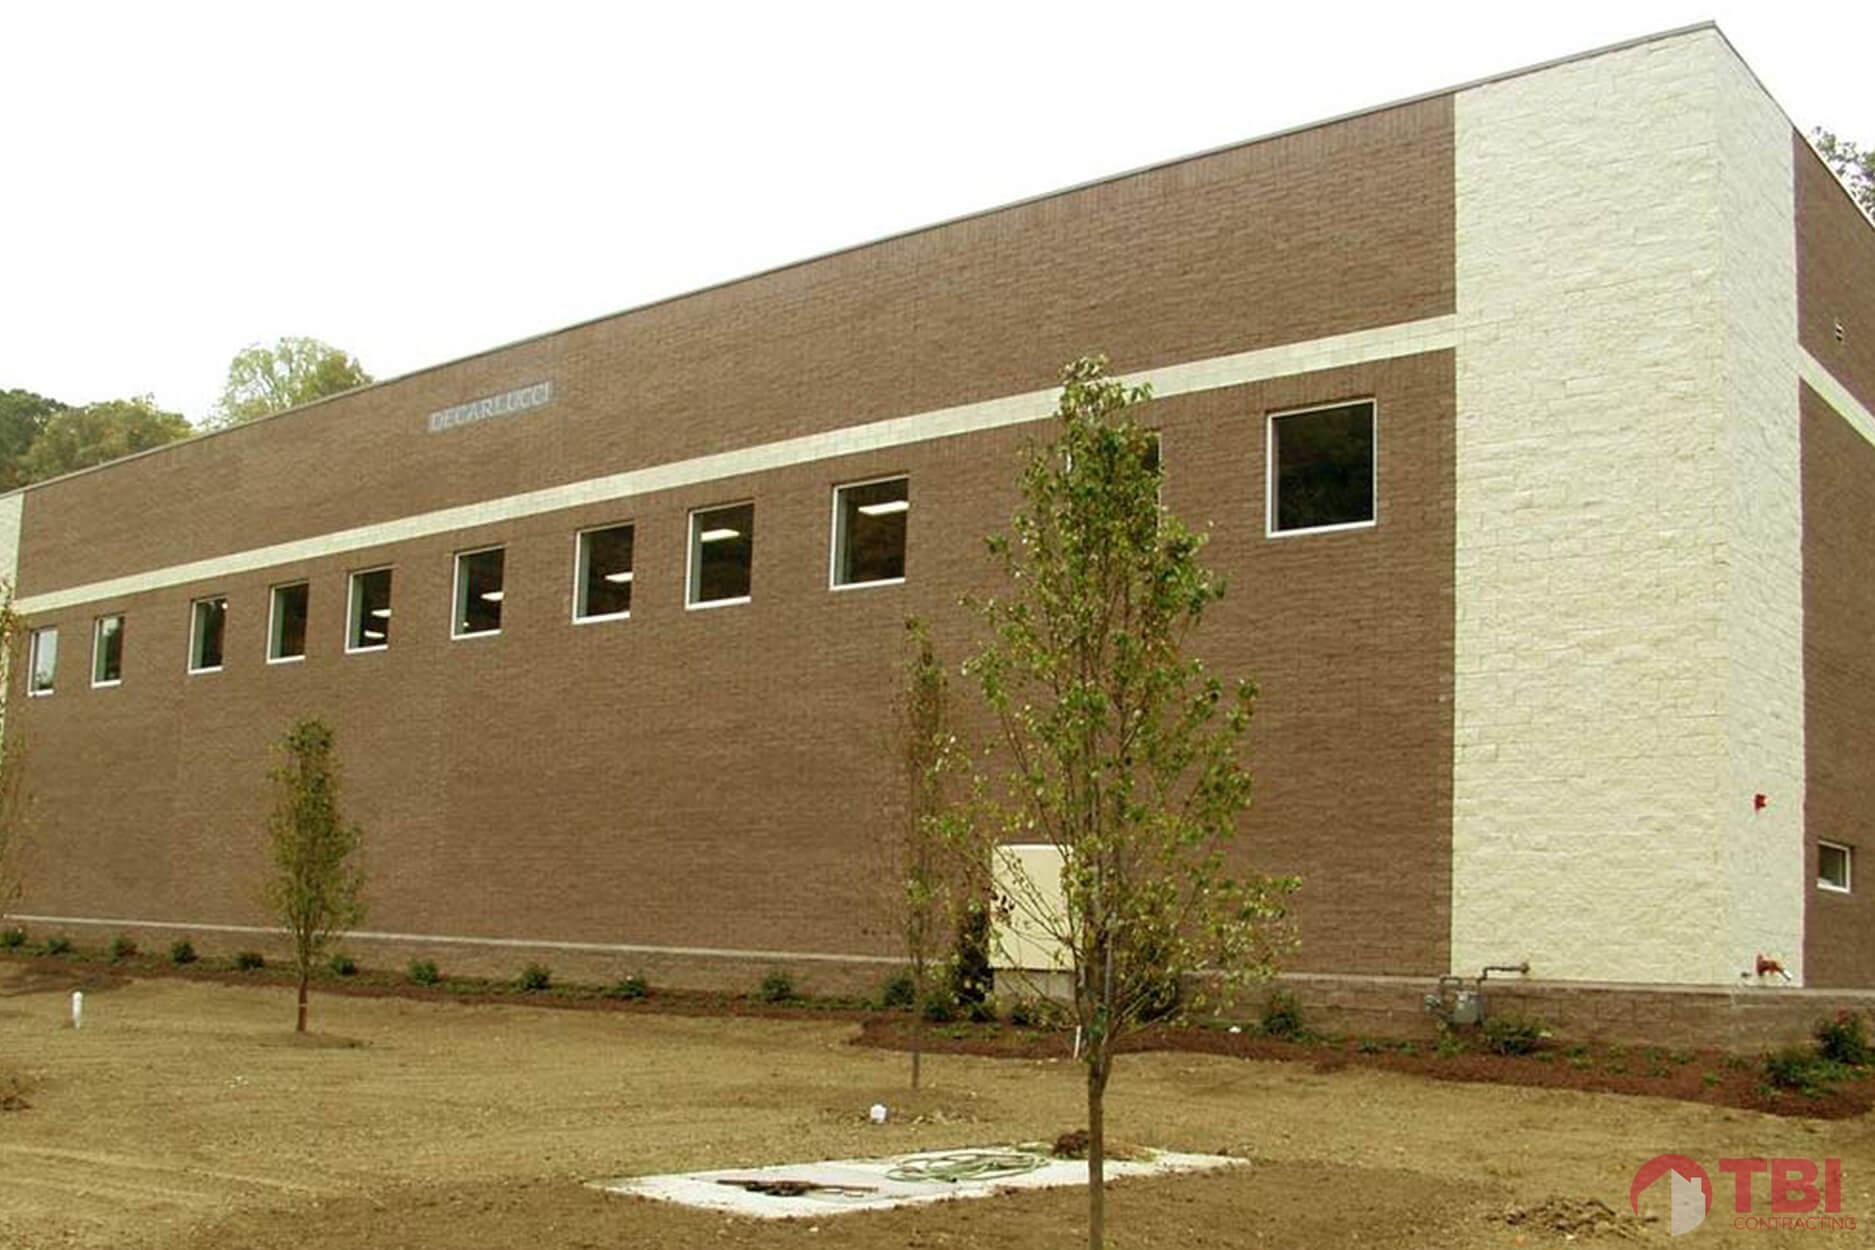 https://tbicontracting.com/wp-content/uploads/2015/04/vincent-james-warehouse-project-2.jpg